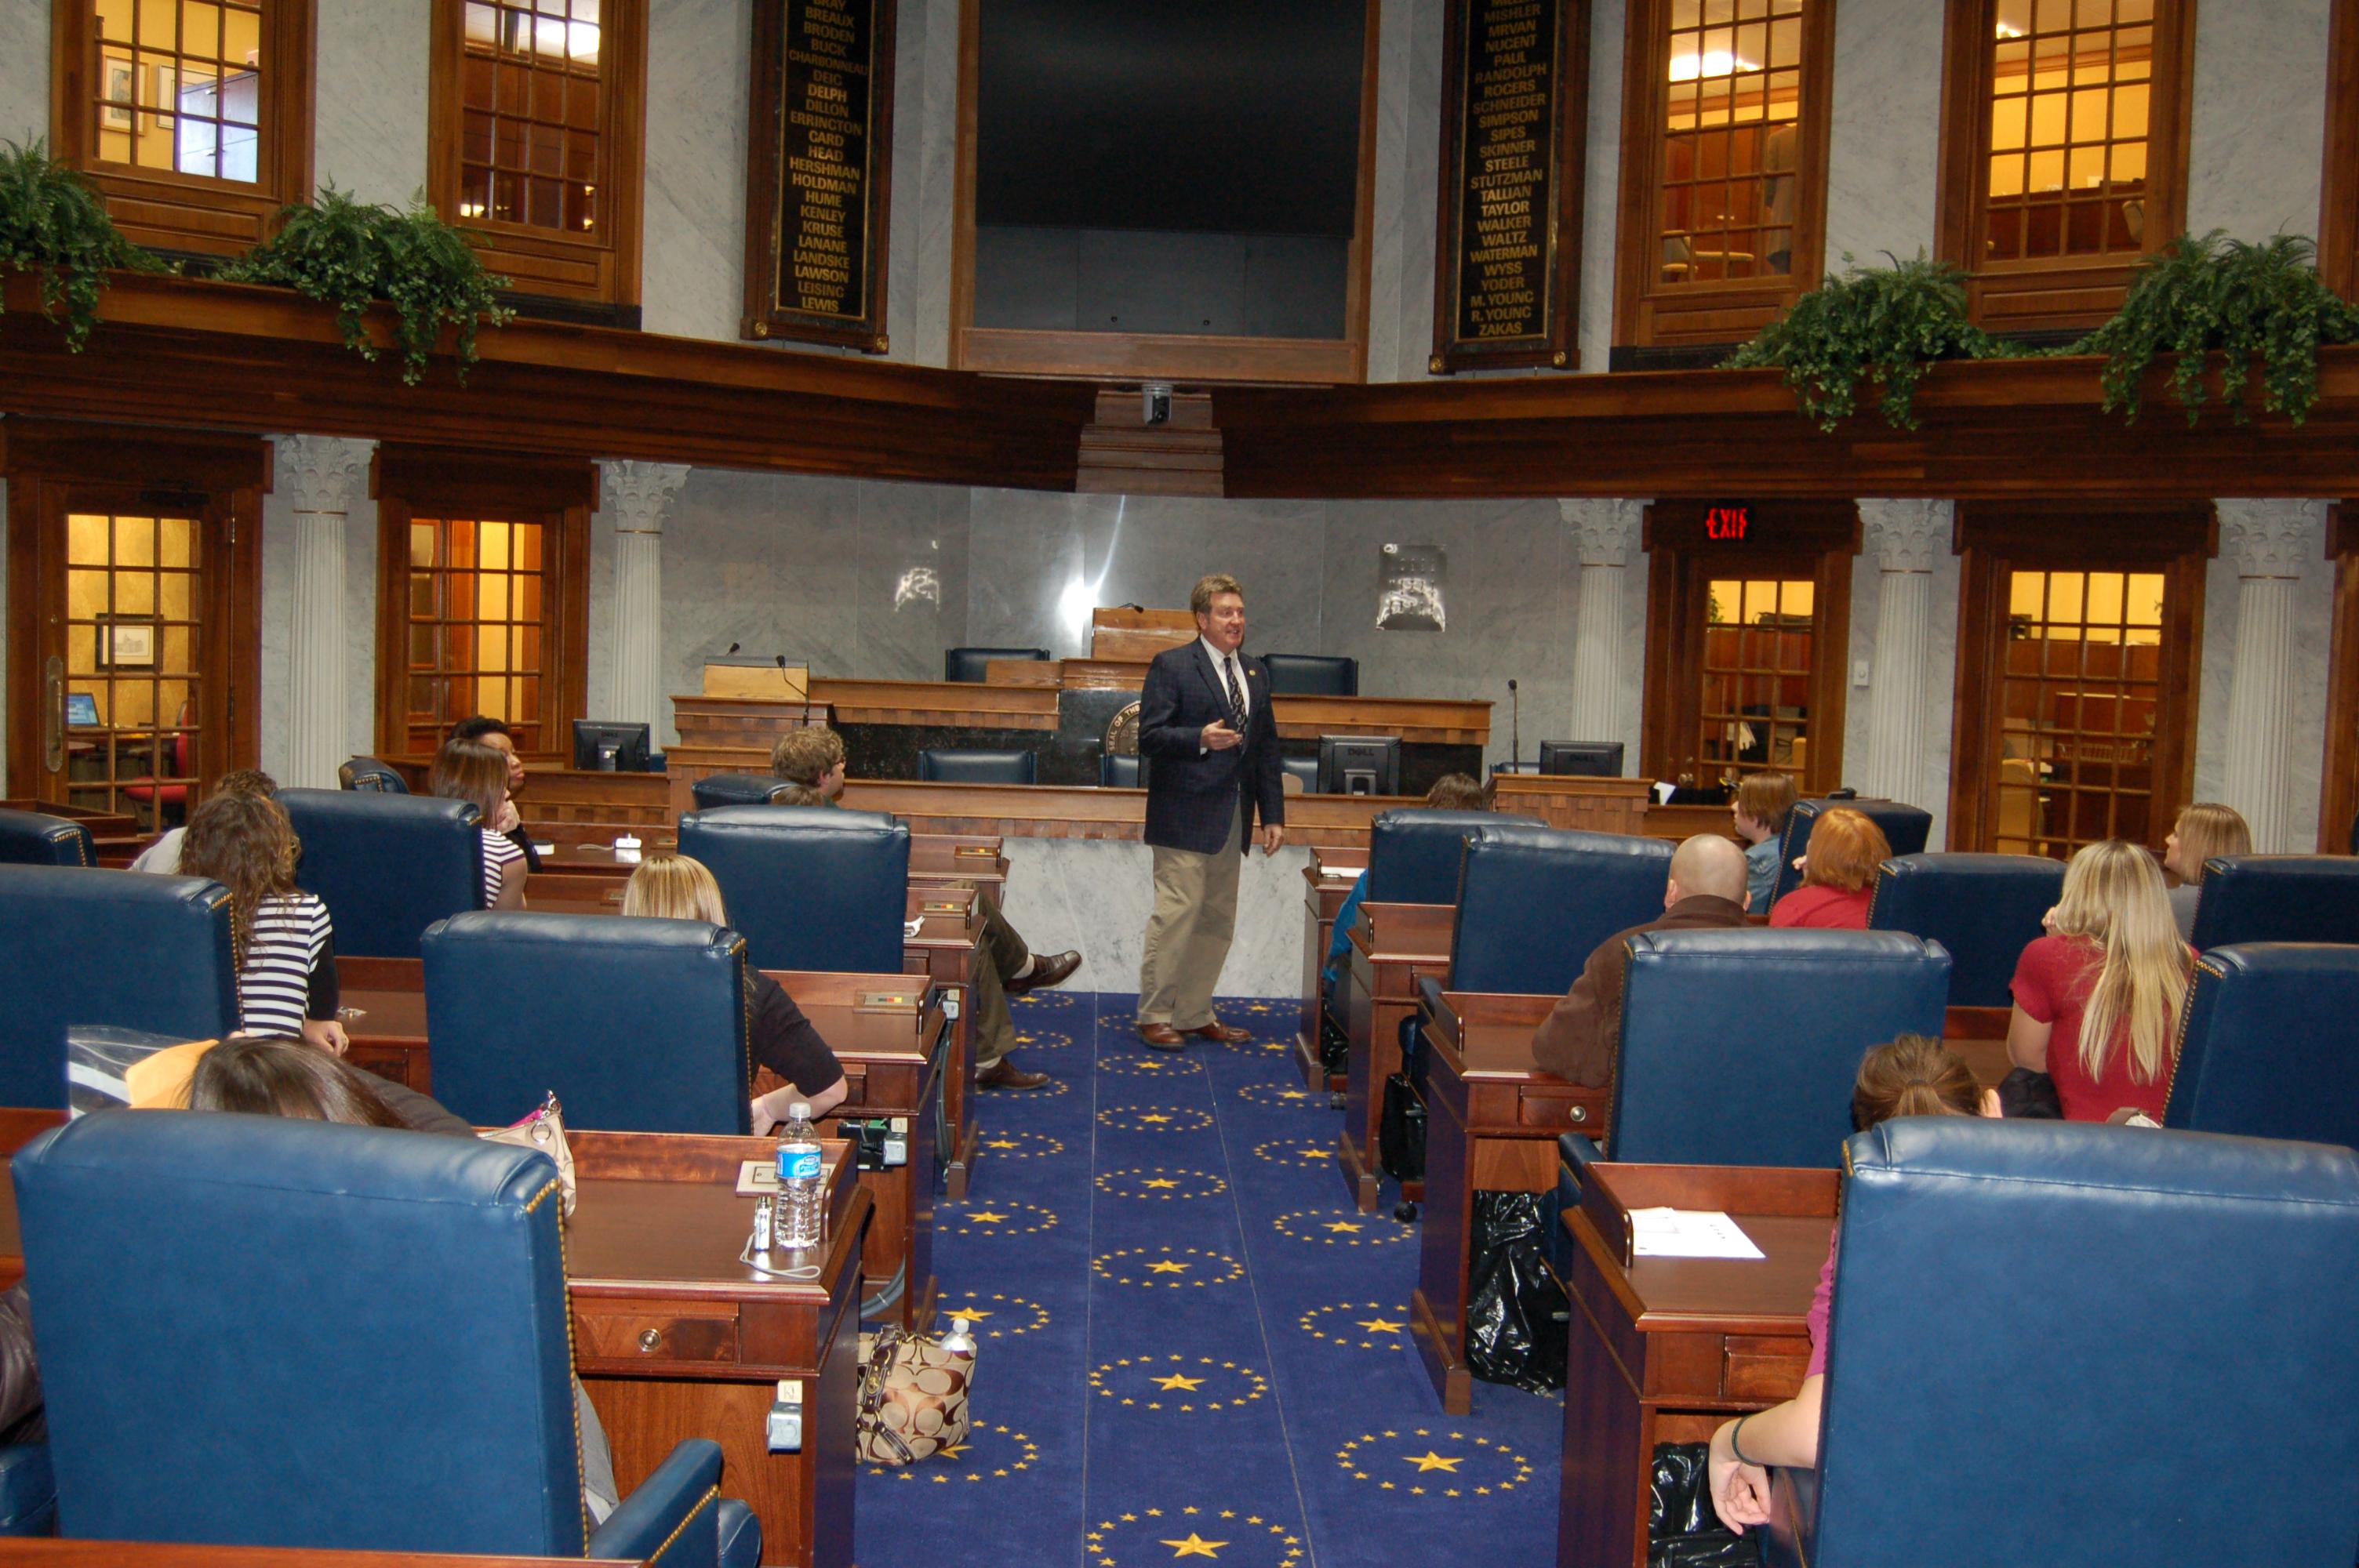 Senator Deig speaks with students in the Senate chamber.